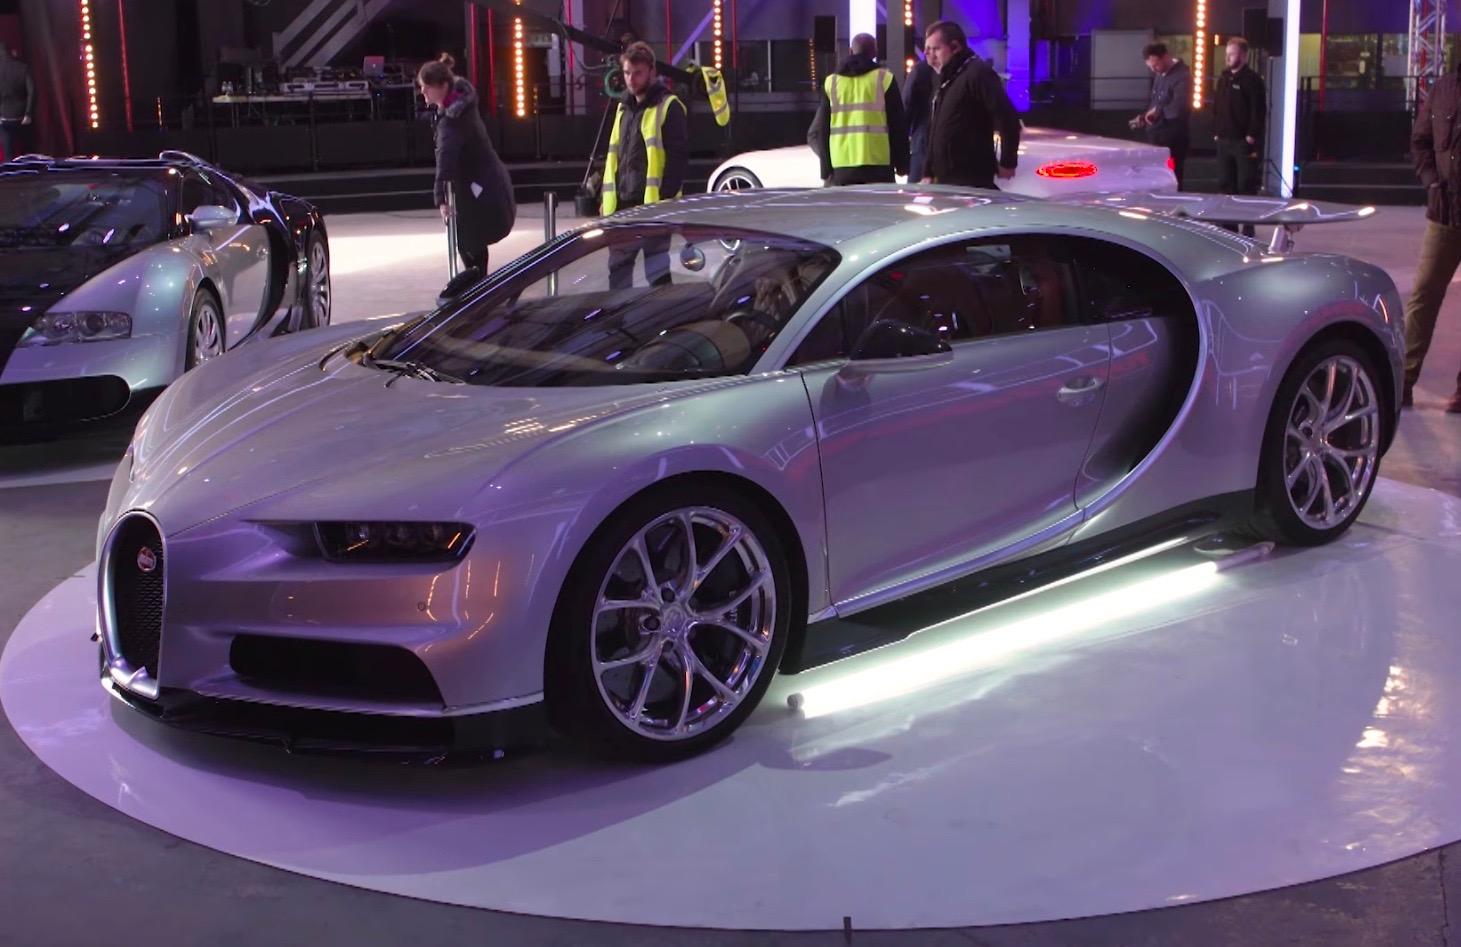 bugatti chiron 39 super sport 39 edition could nudge 500km h video performancedrive. Black Bedroom Furniture Sets. Home Design Ideas